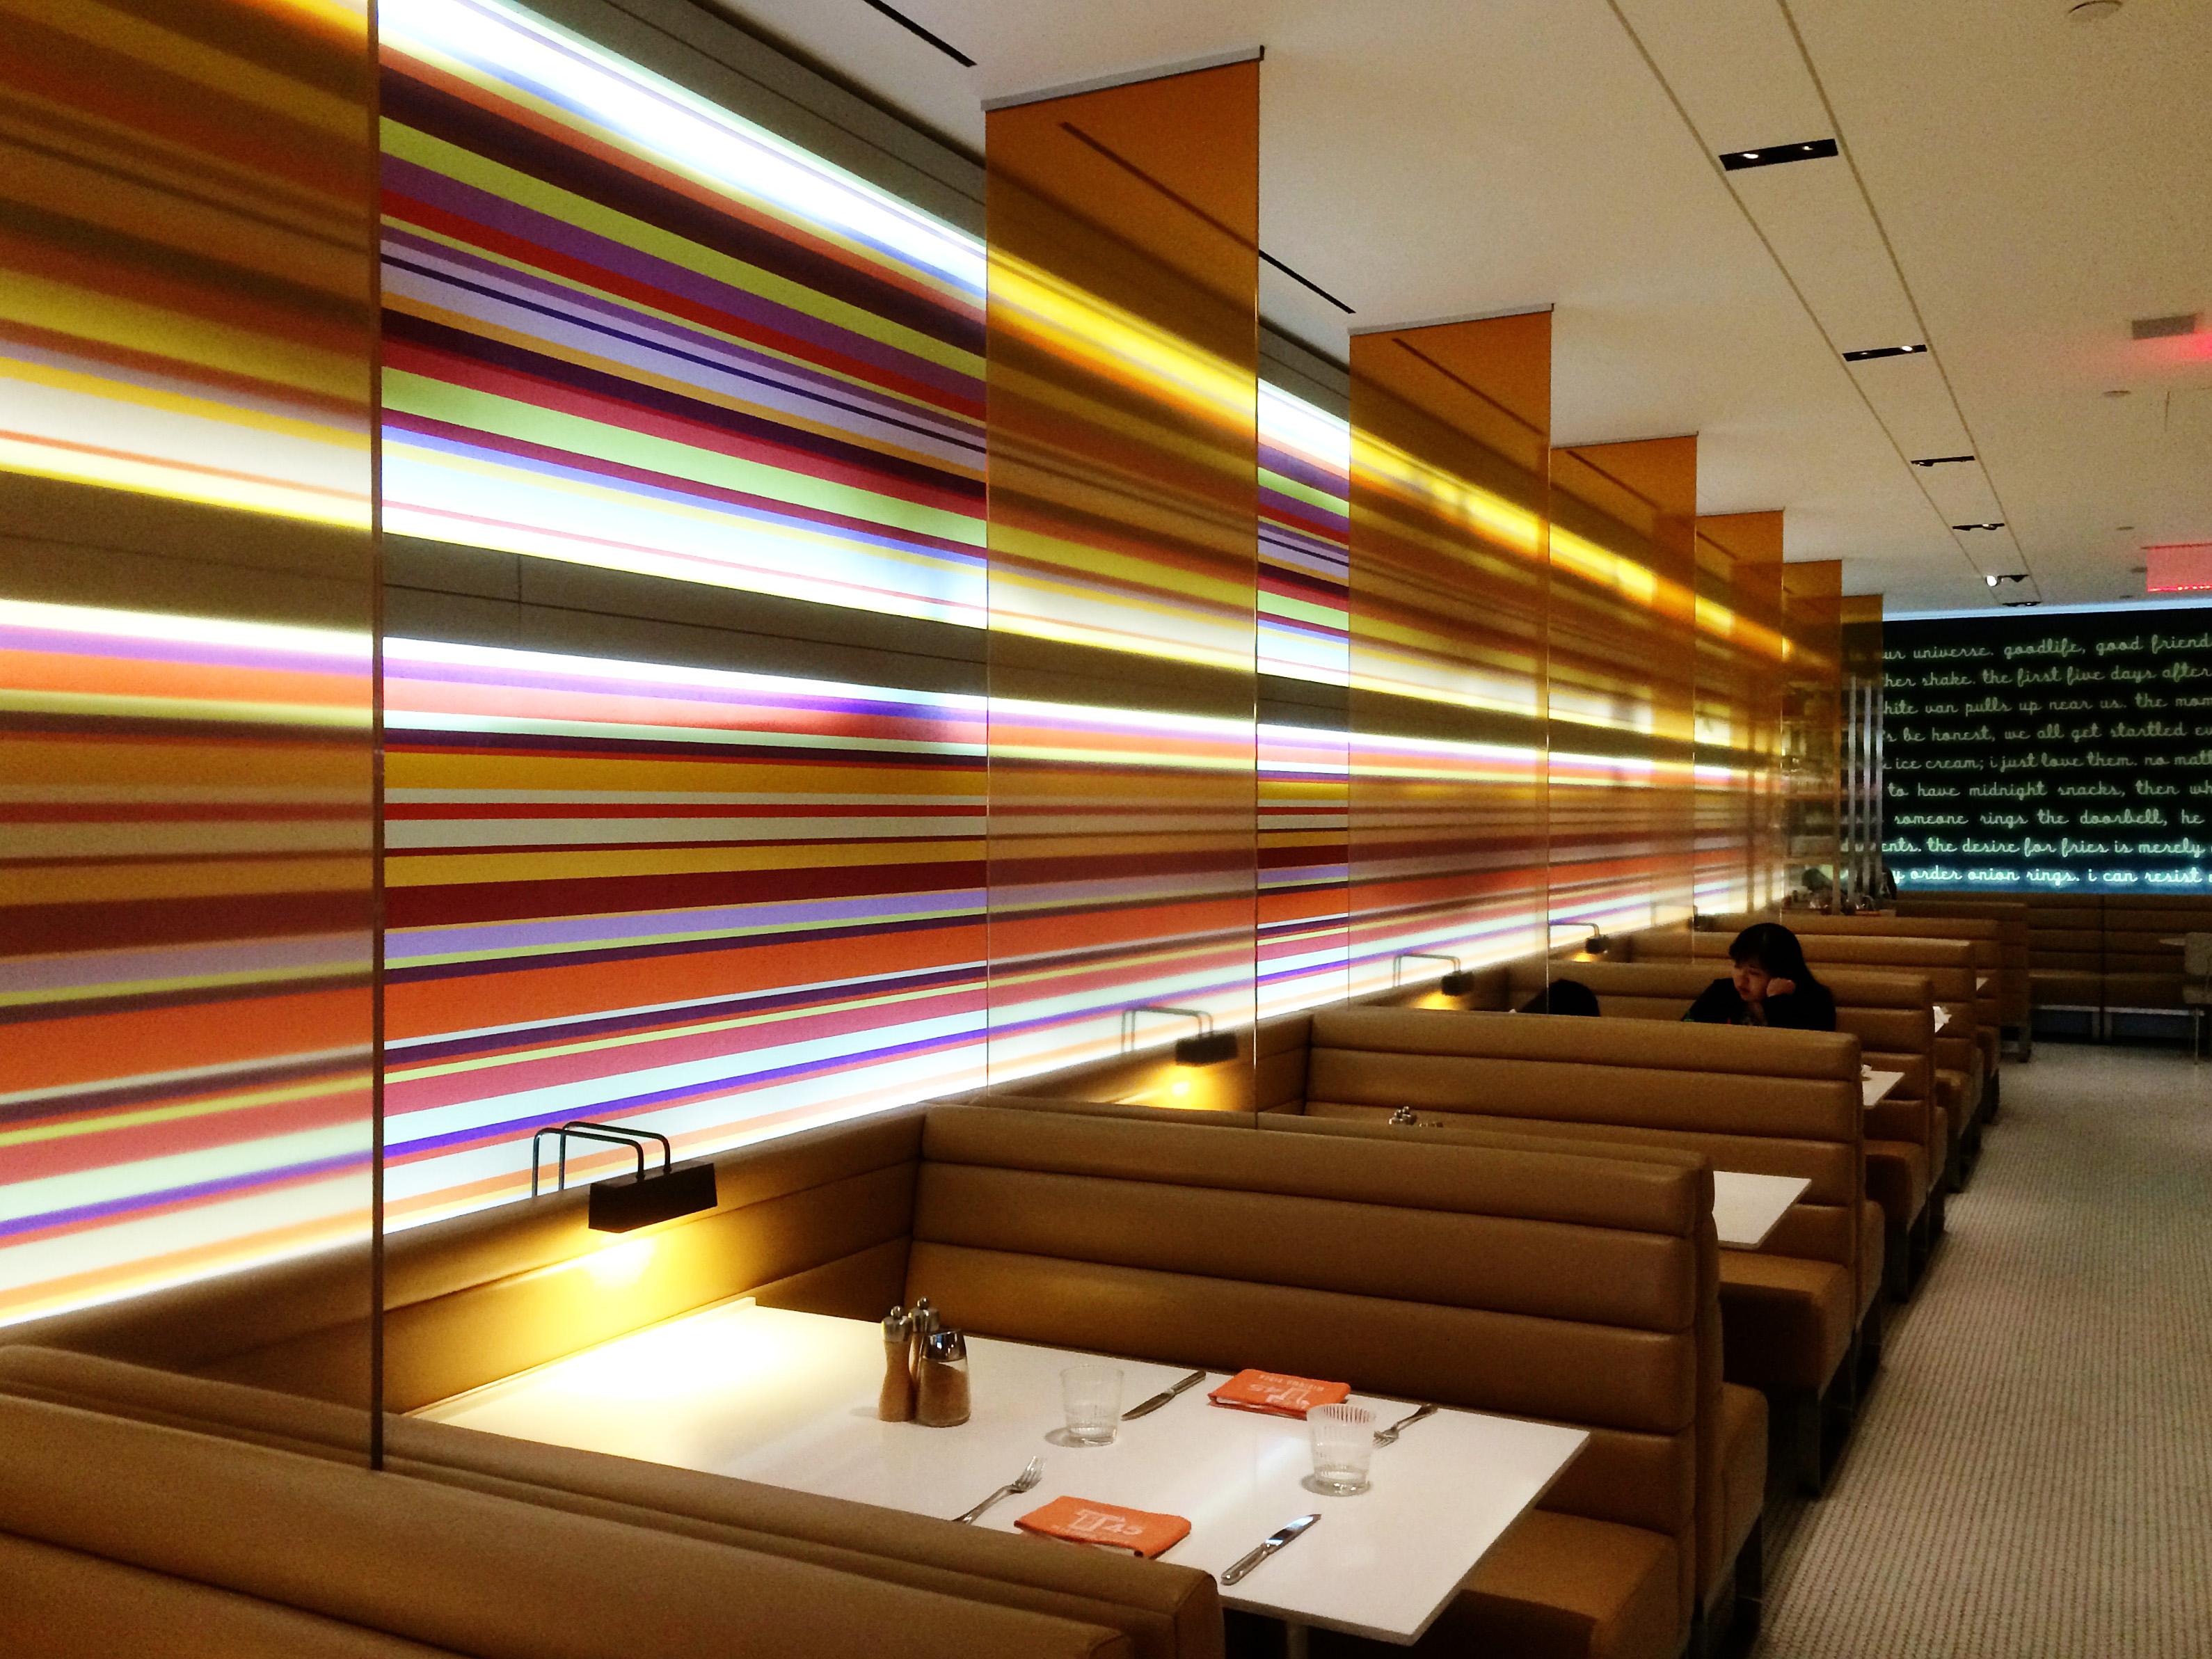 Light Auditorium Seat Restaurant City Wall Decoration Nyc Usa Diner Lighting Interior Design New York Convention